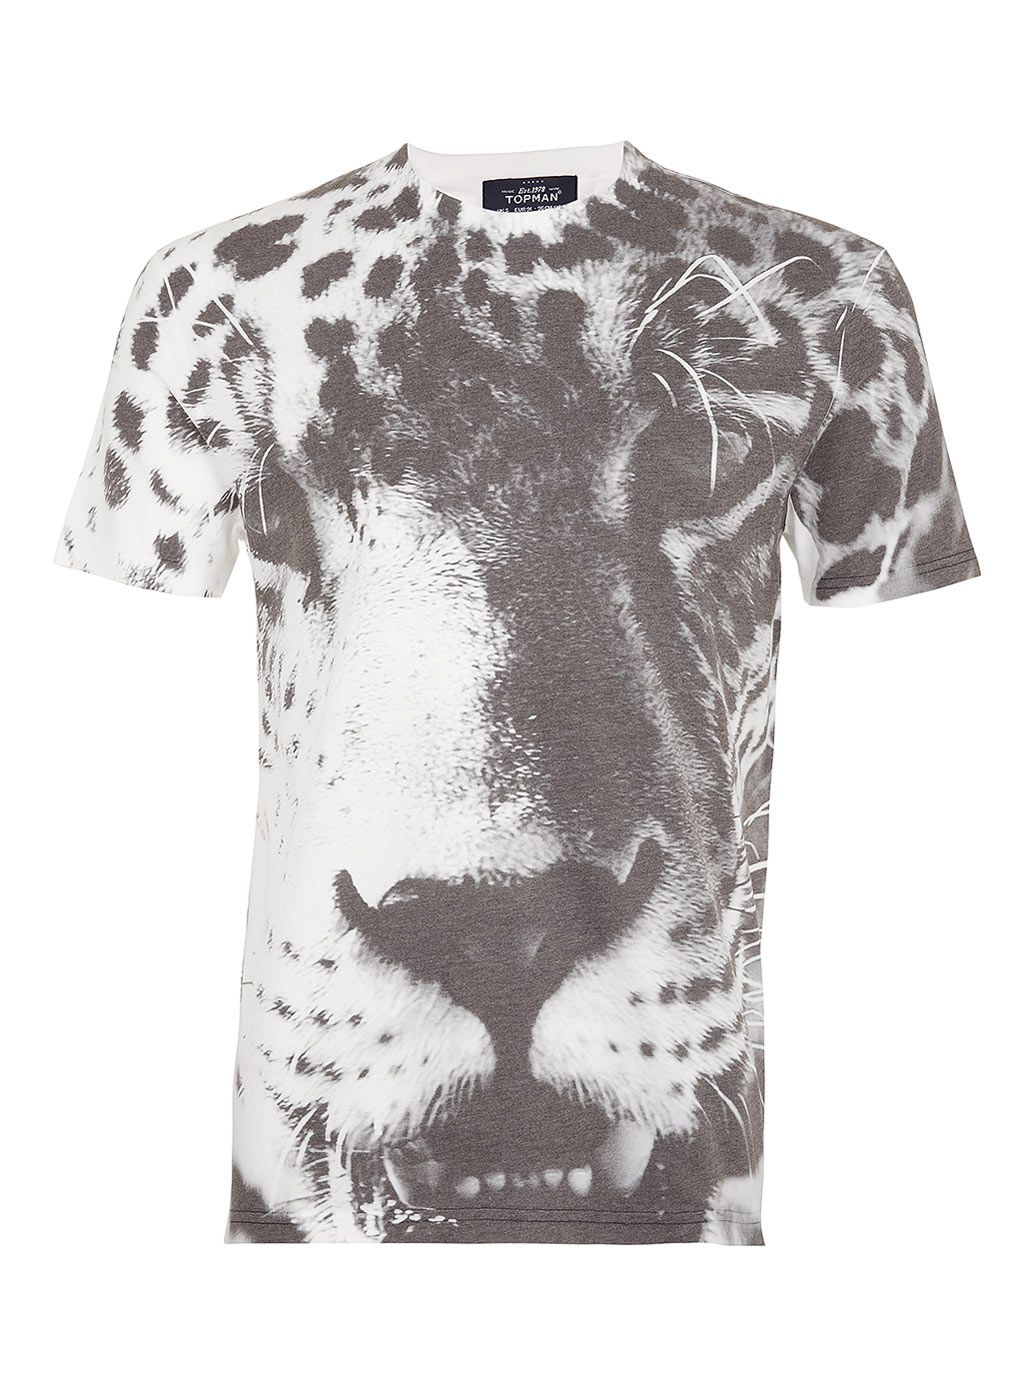 Leopard Face Print TShirt Men's Tshirts Clothing